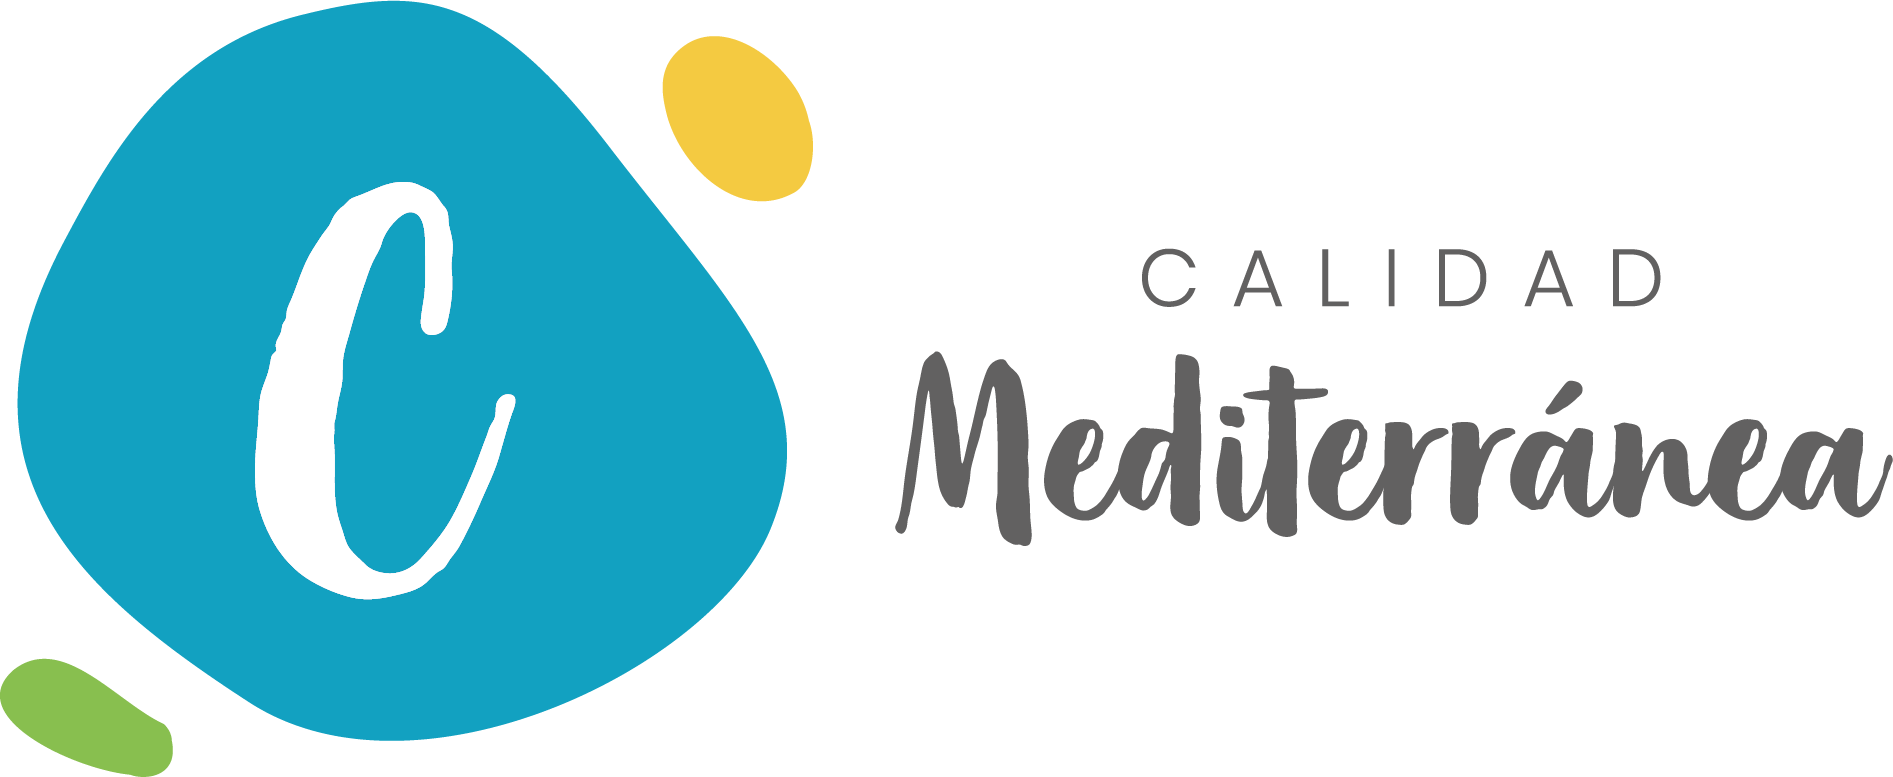 Calidad Mediterránea